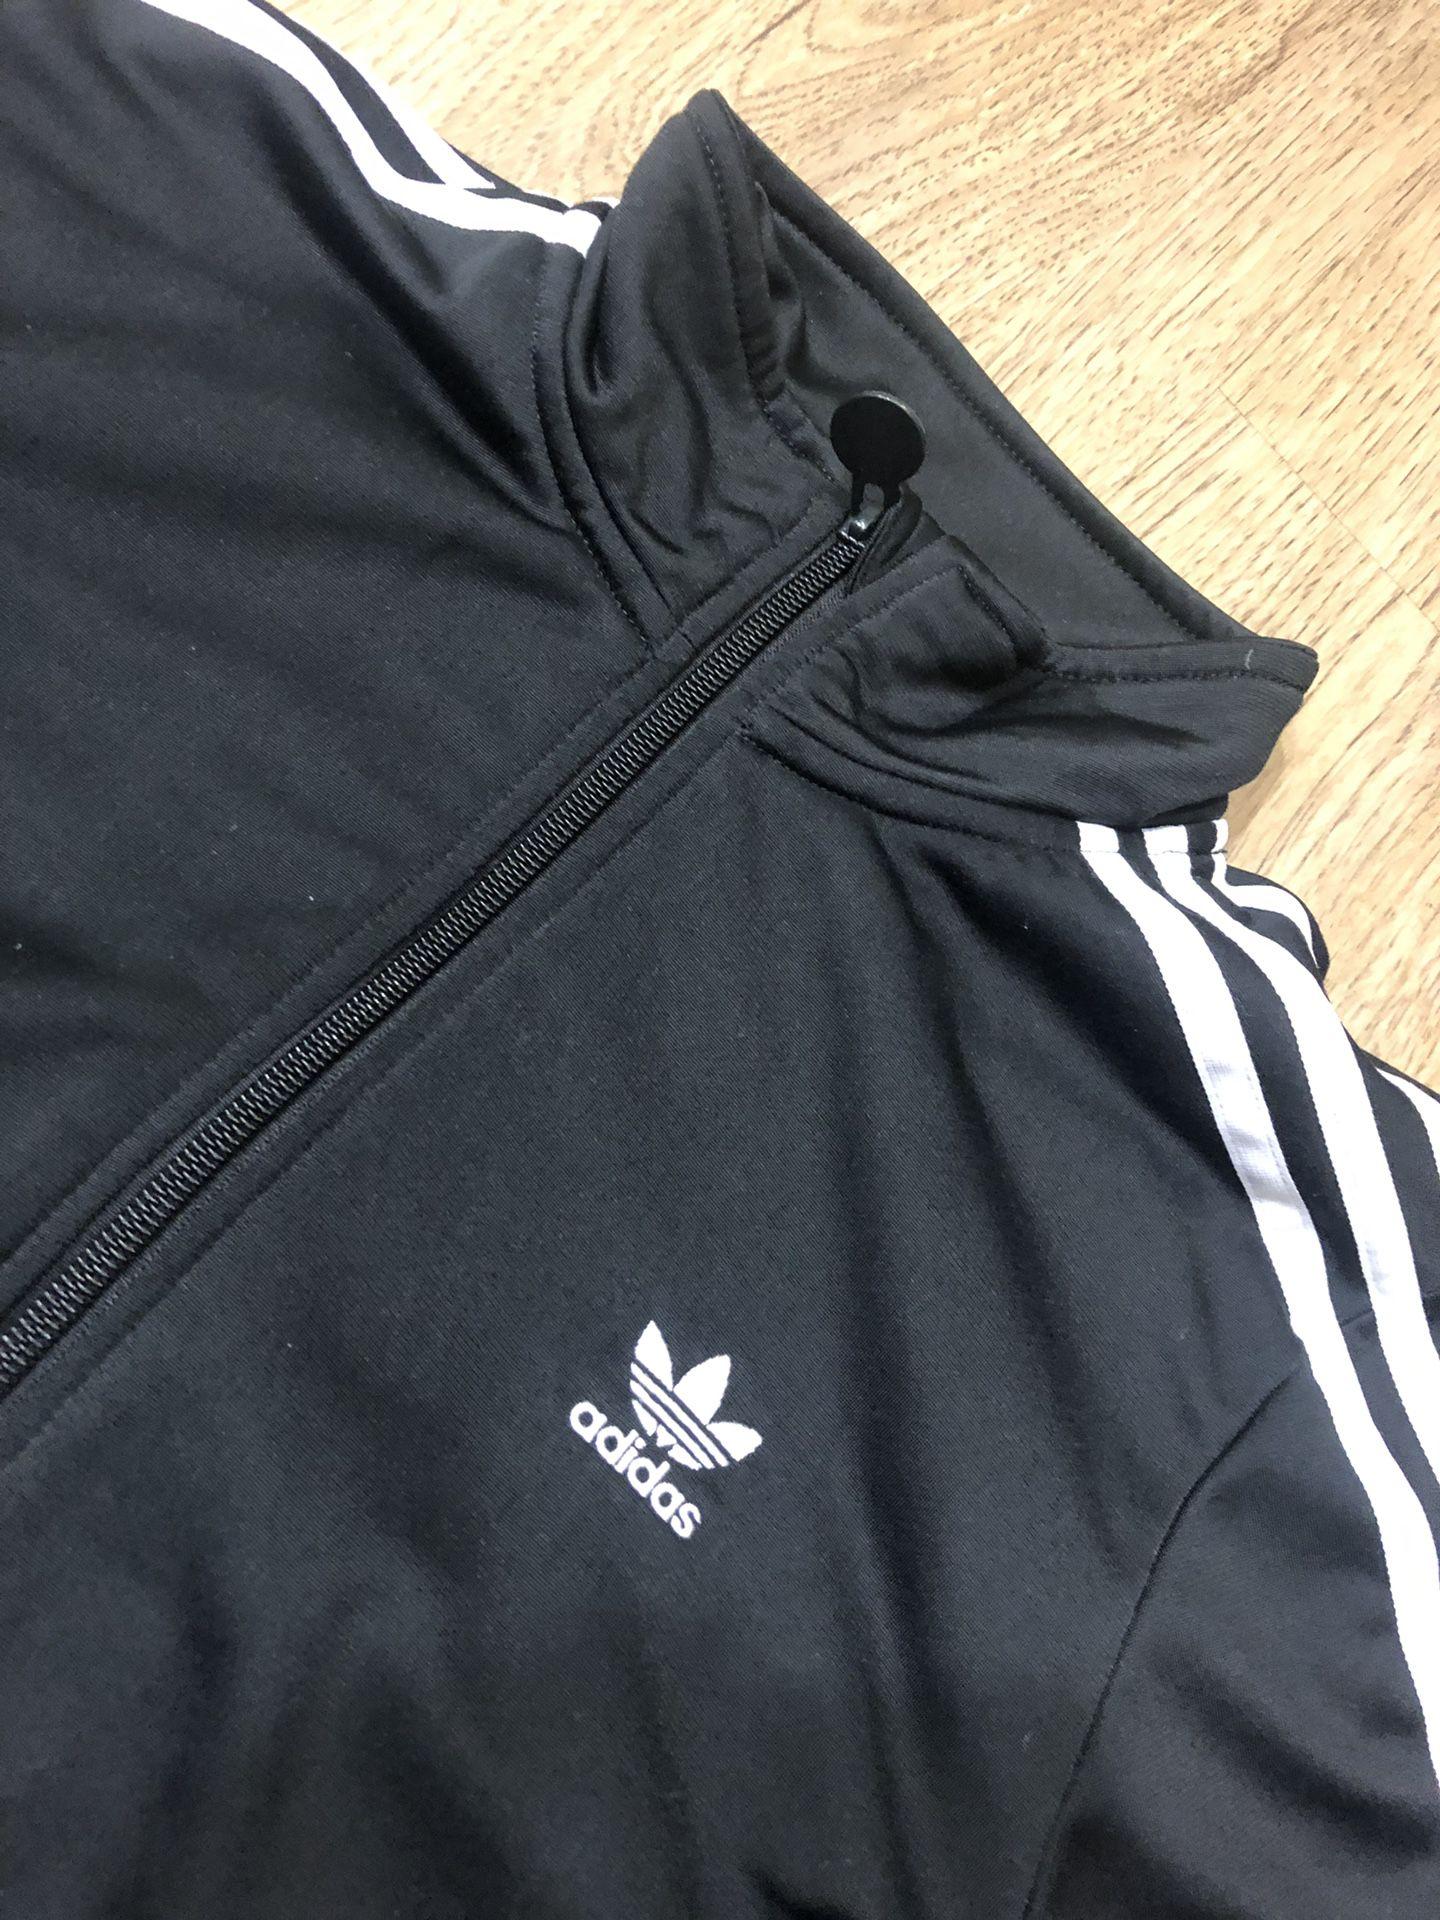 Kids Adidas Black/White Track Jacket Size XL